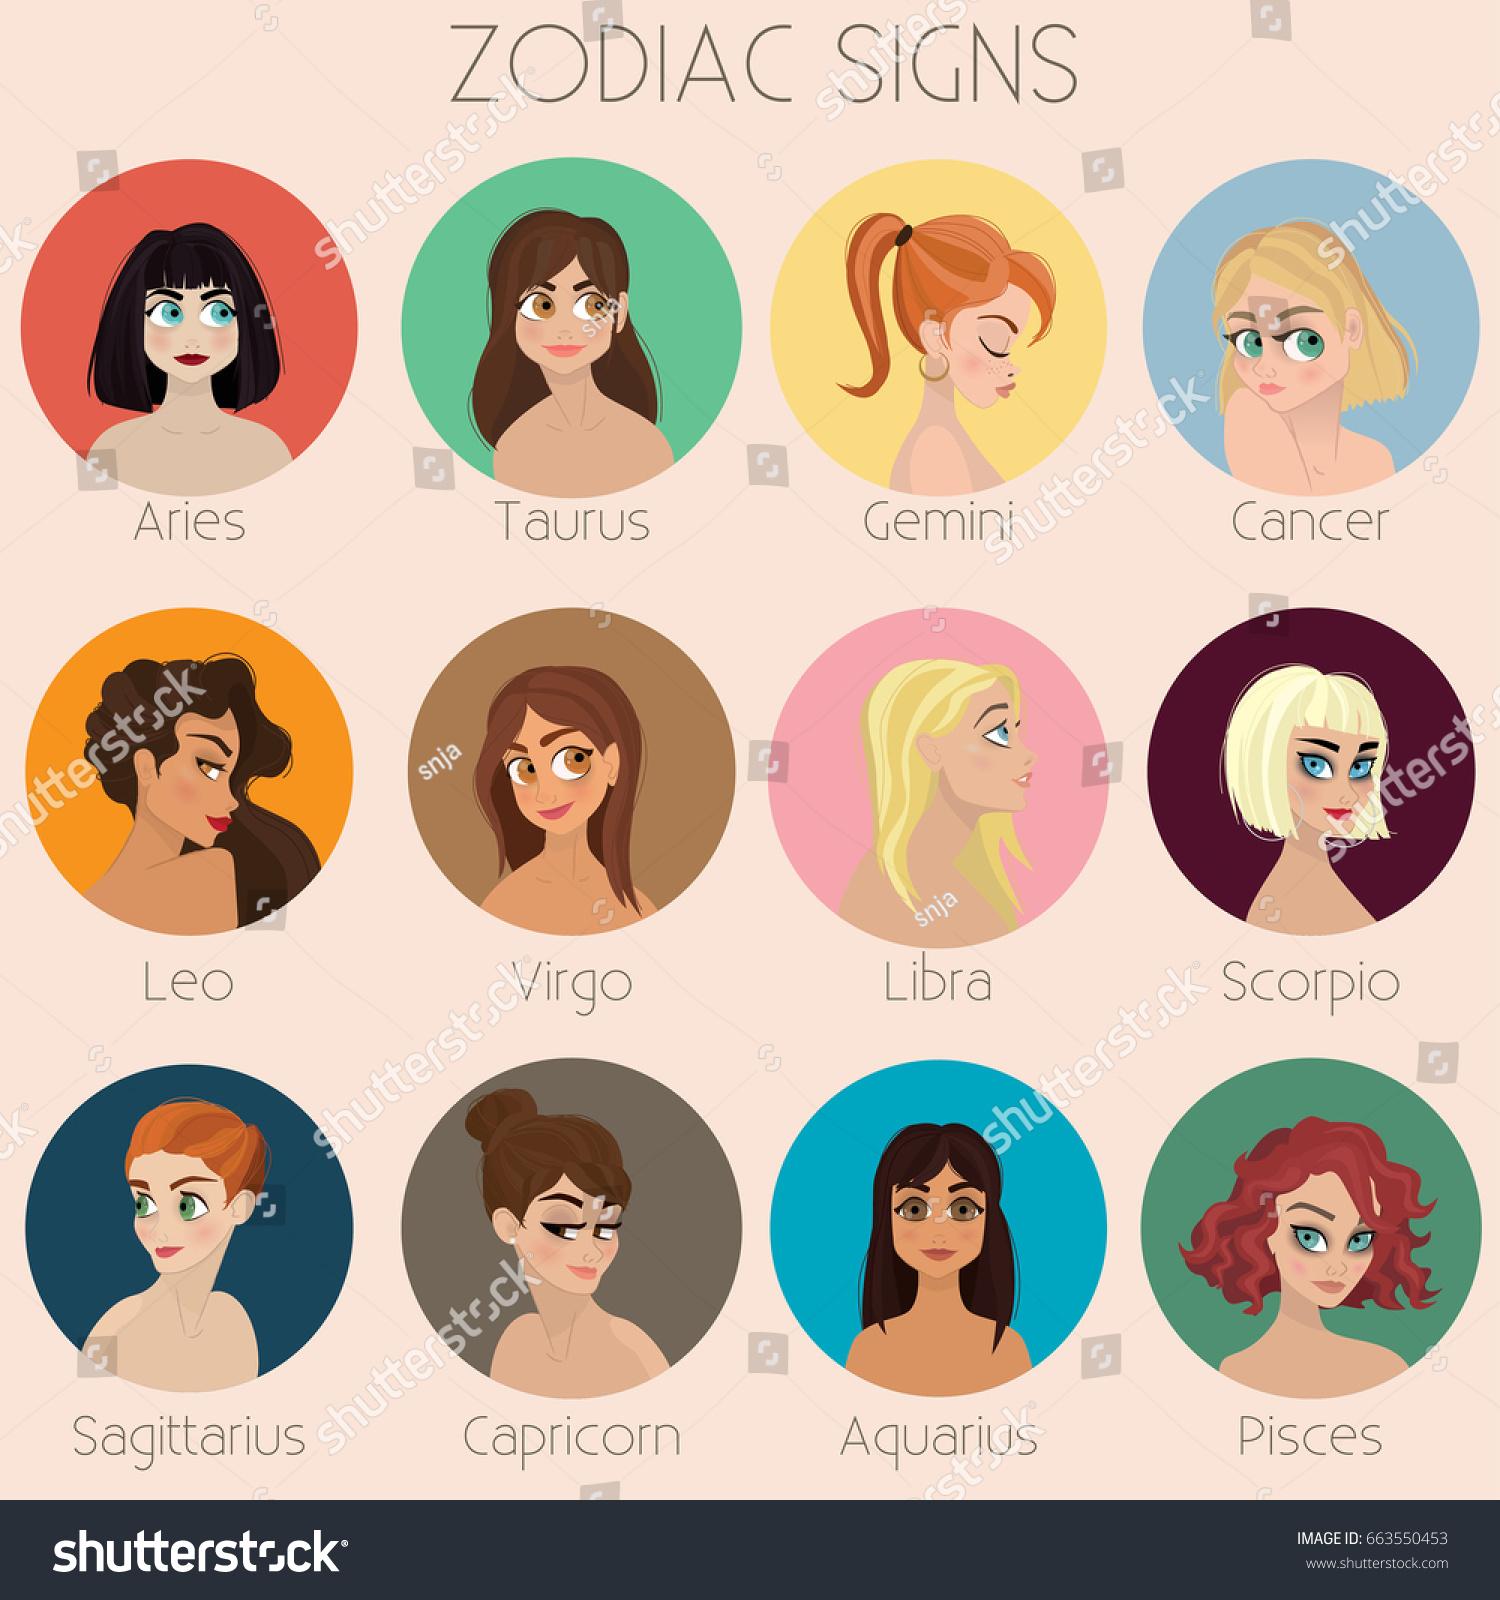 zodiac signs girls illustrations horoscope vector stock-vektorgrafik